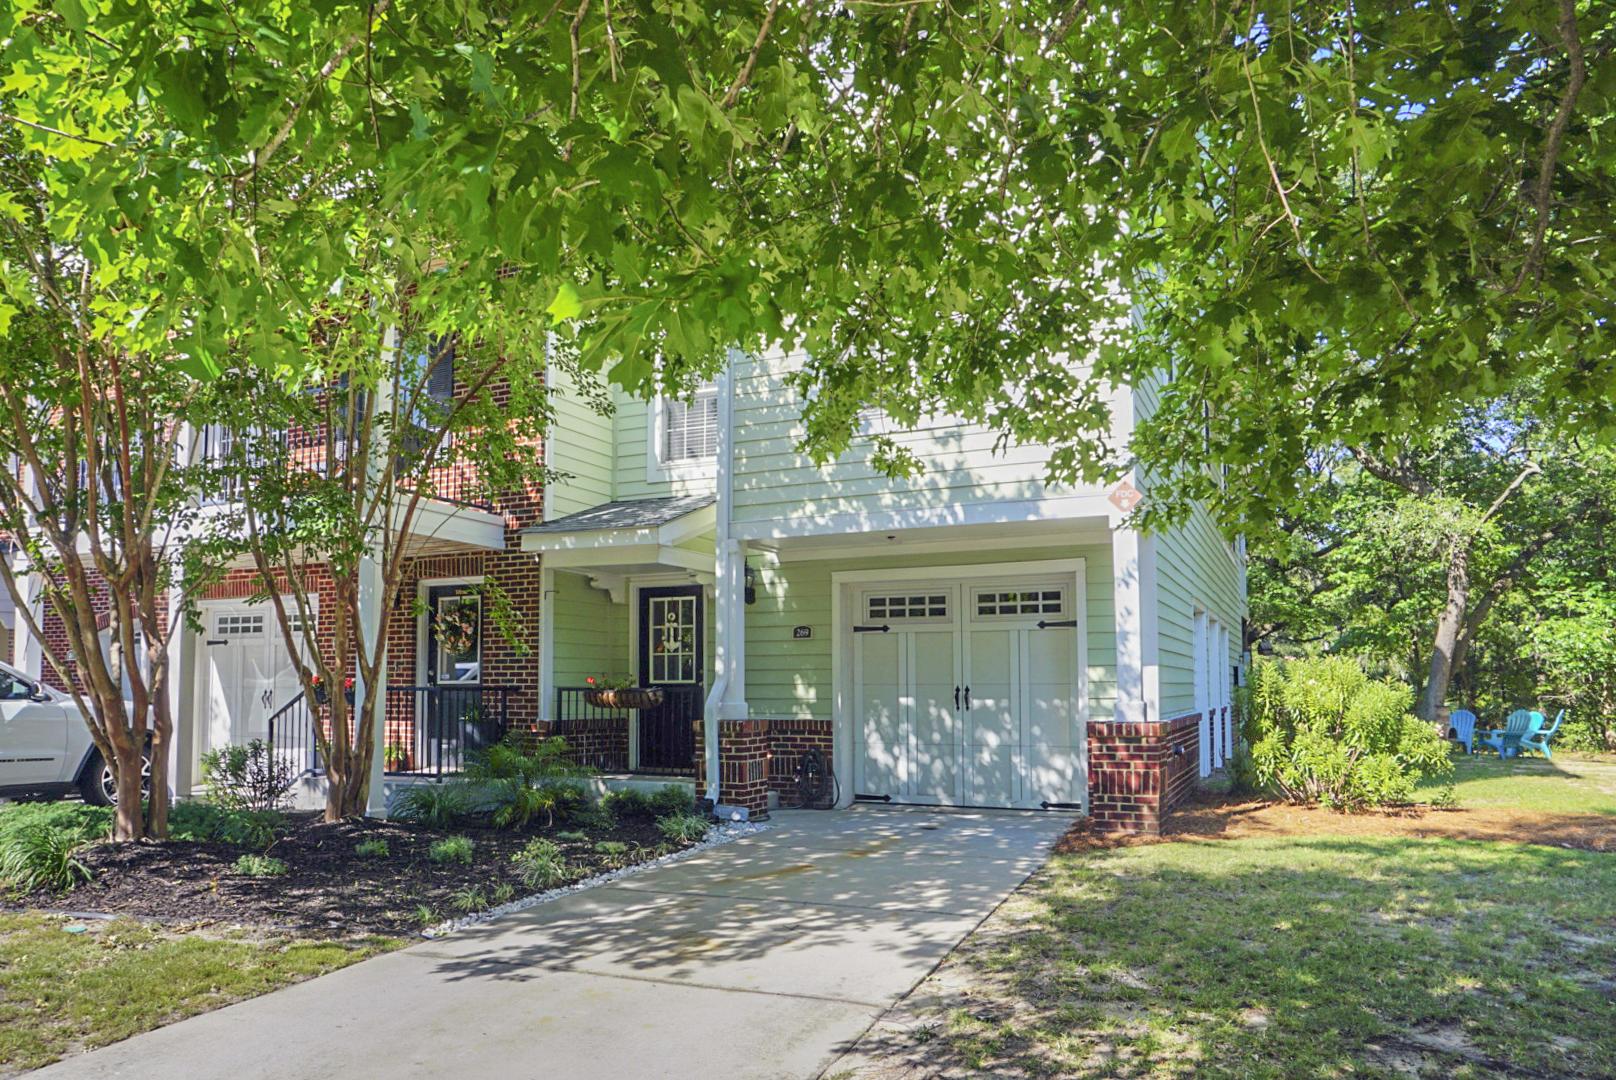 Etiwan Pointe Homes For Sale - 269 Etiwan Pointe, Mount Pleasant, SC - 5